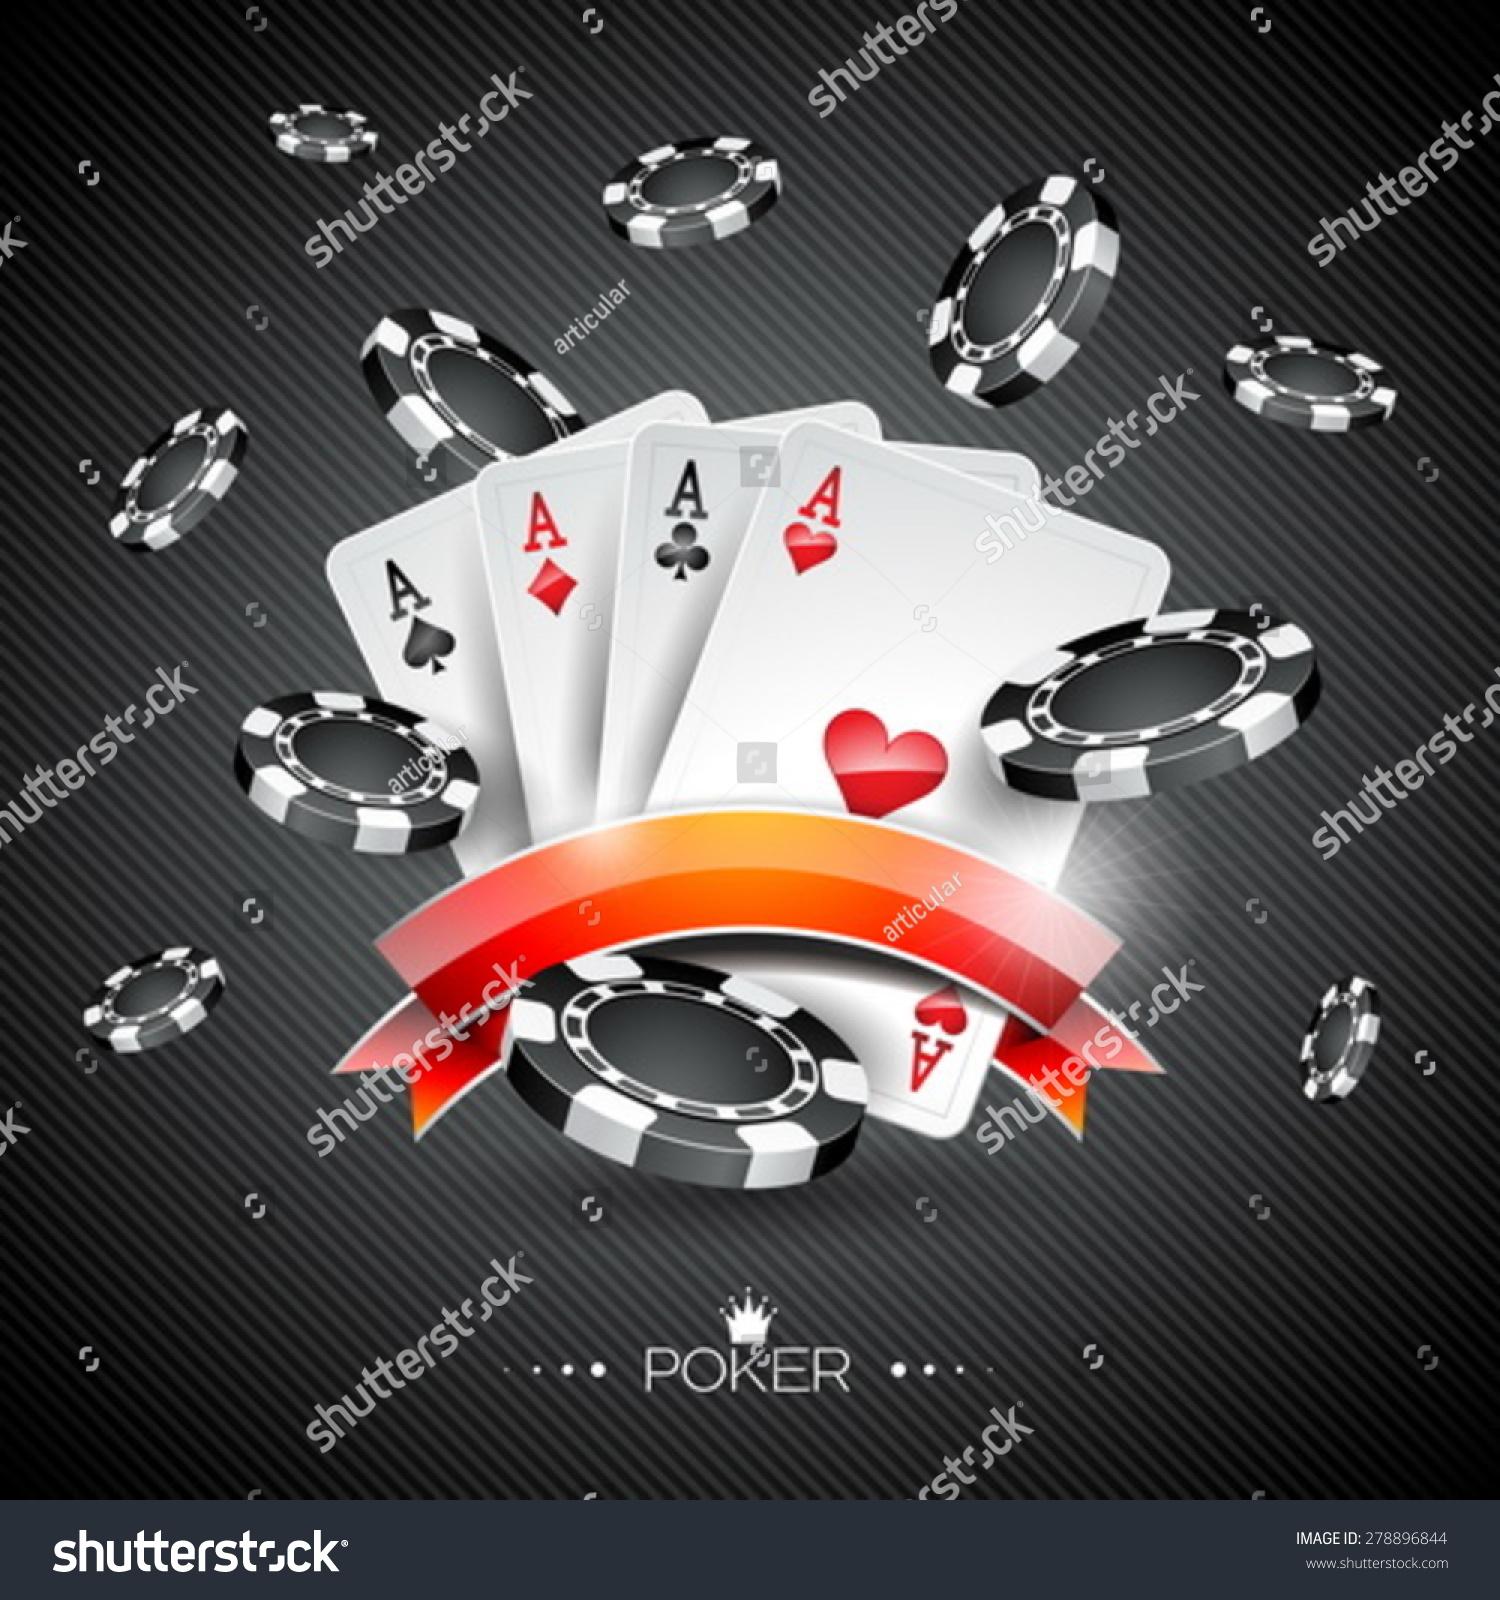 Poker stock images